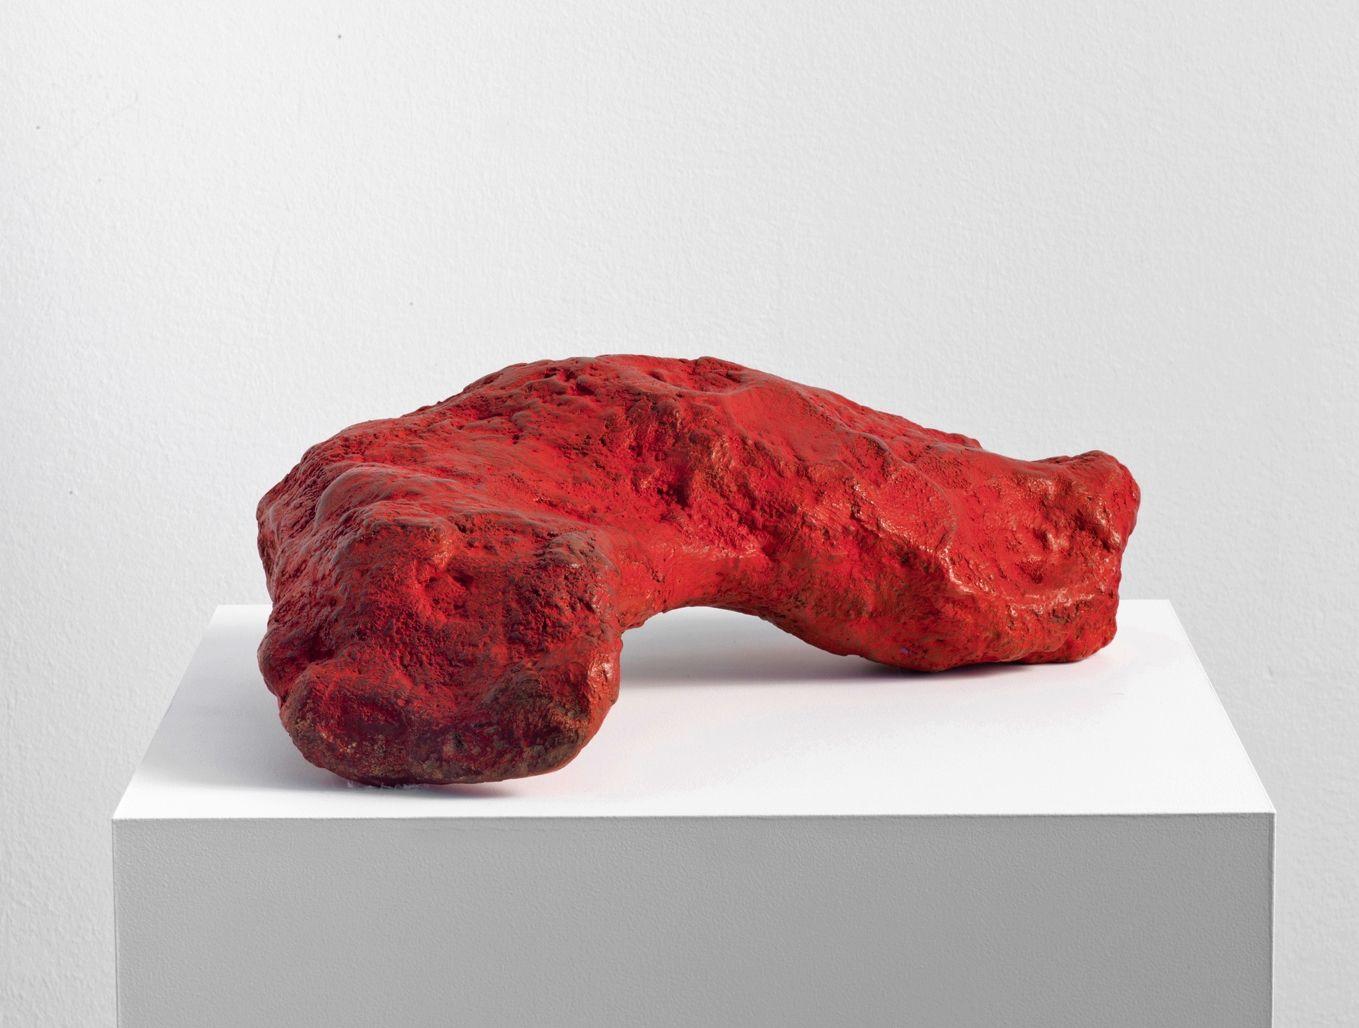 Oedipus, 2014, bronze, 6 x 21 x 14 in., ed. of 5